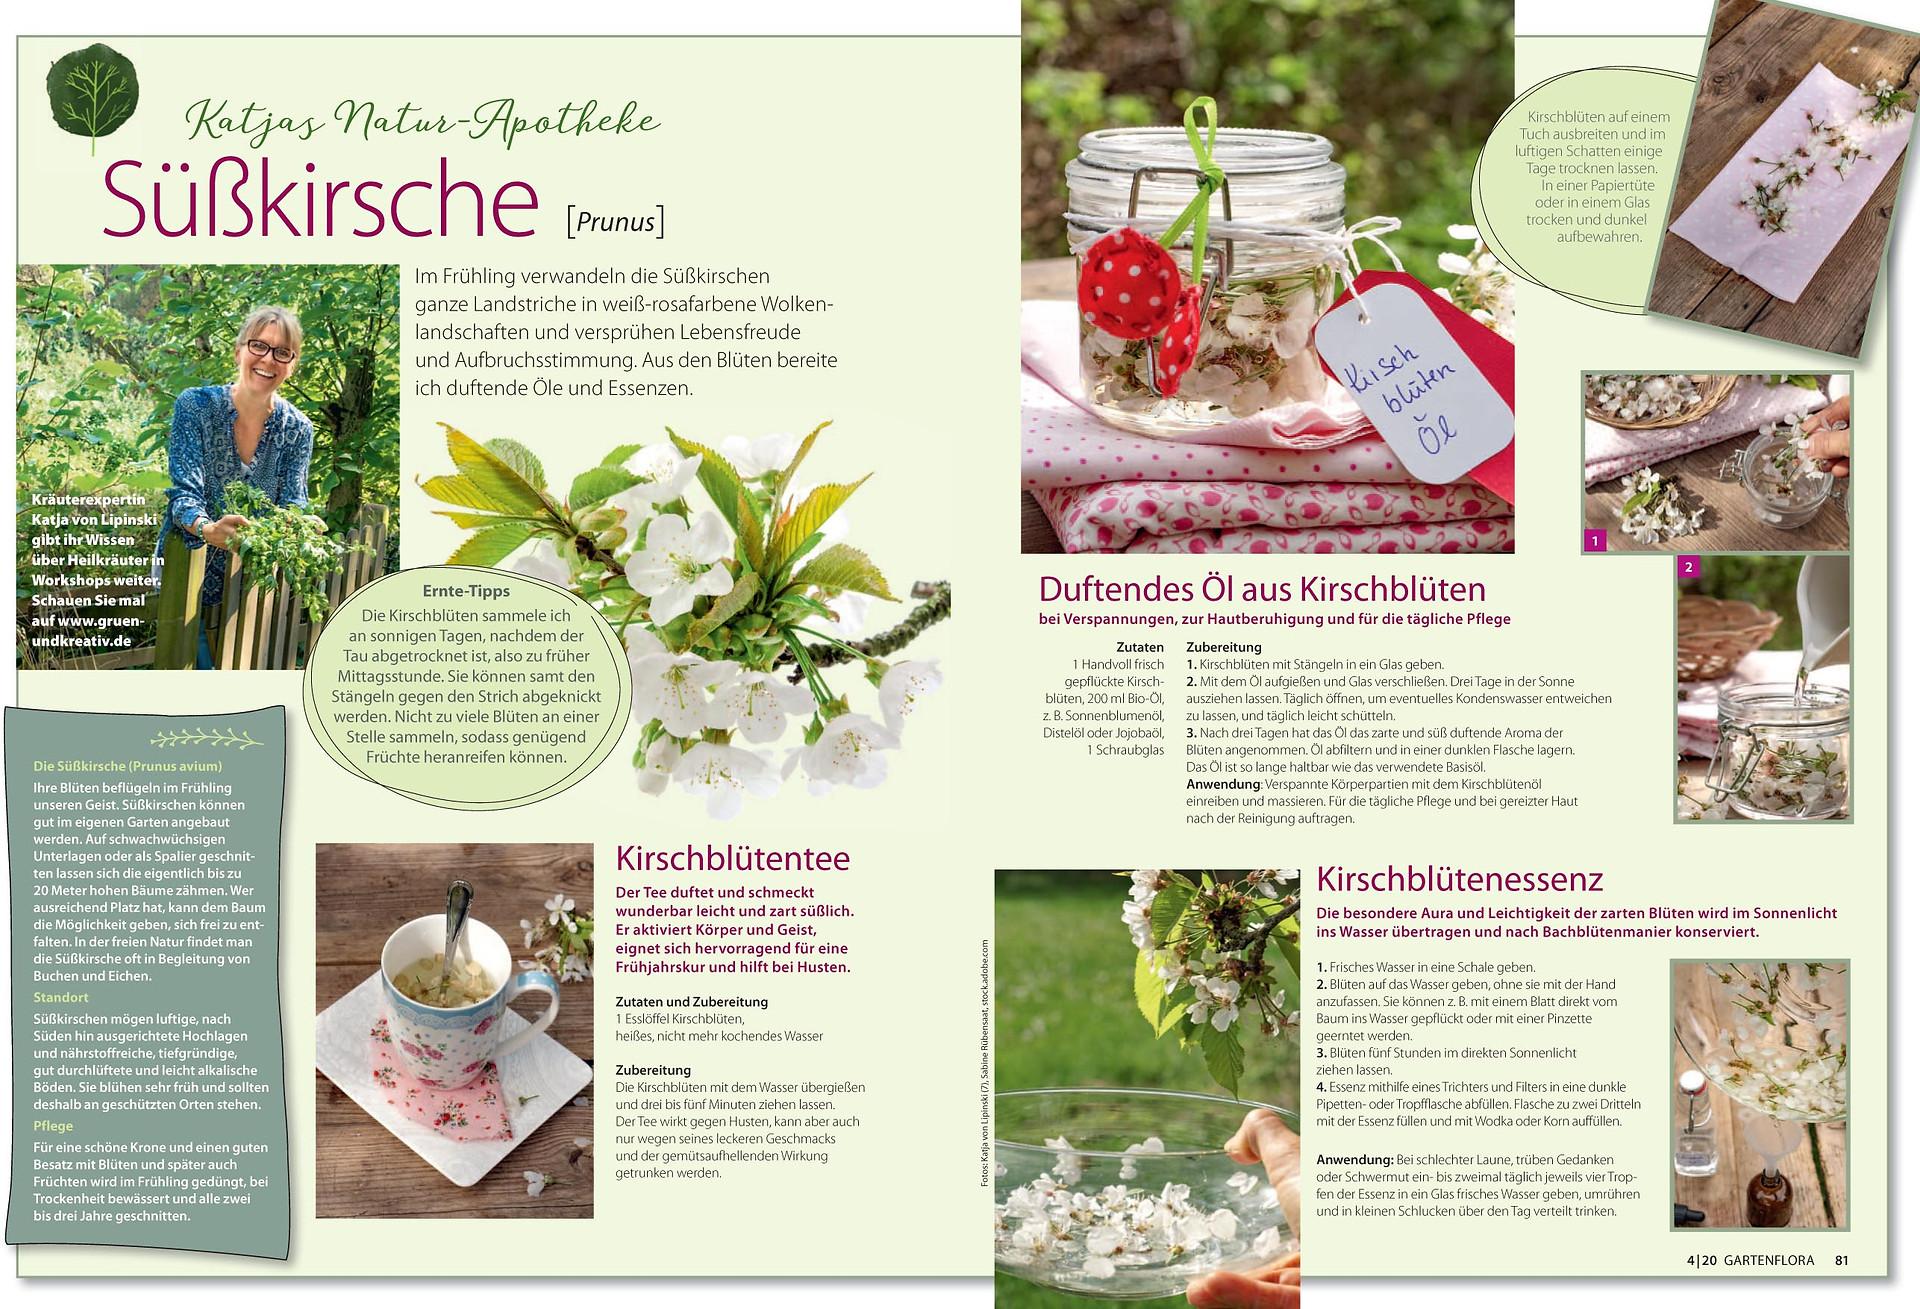 Katjas Natur-Apotheke 04 20 GartenFlora.